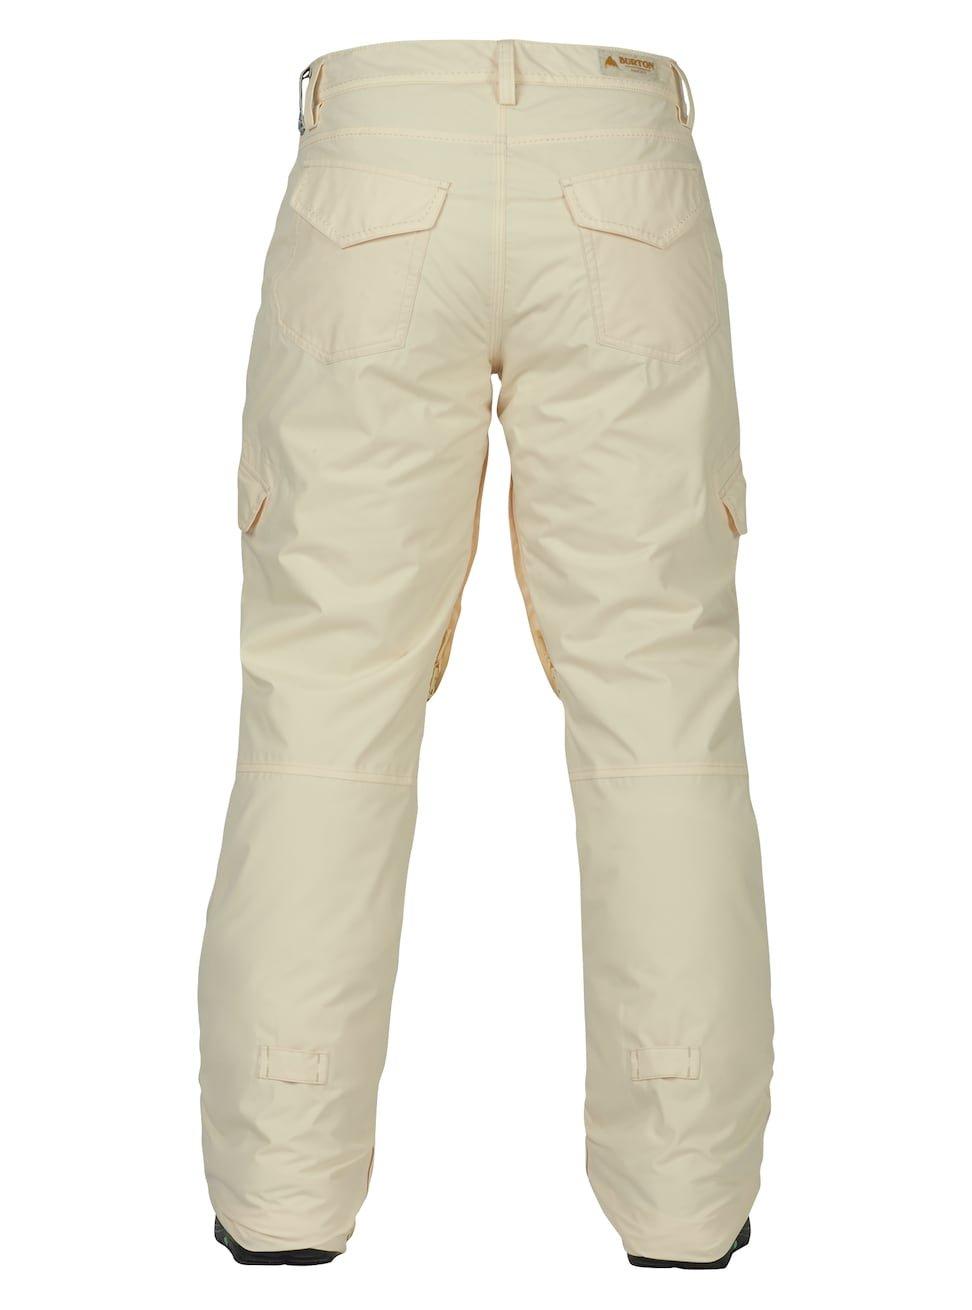 d0f8cc7cbd44 Amazon.com : Burton Fly Snowboard Pants Womens : Clothing